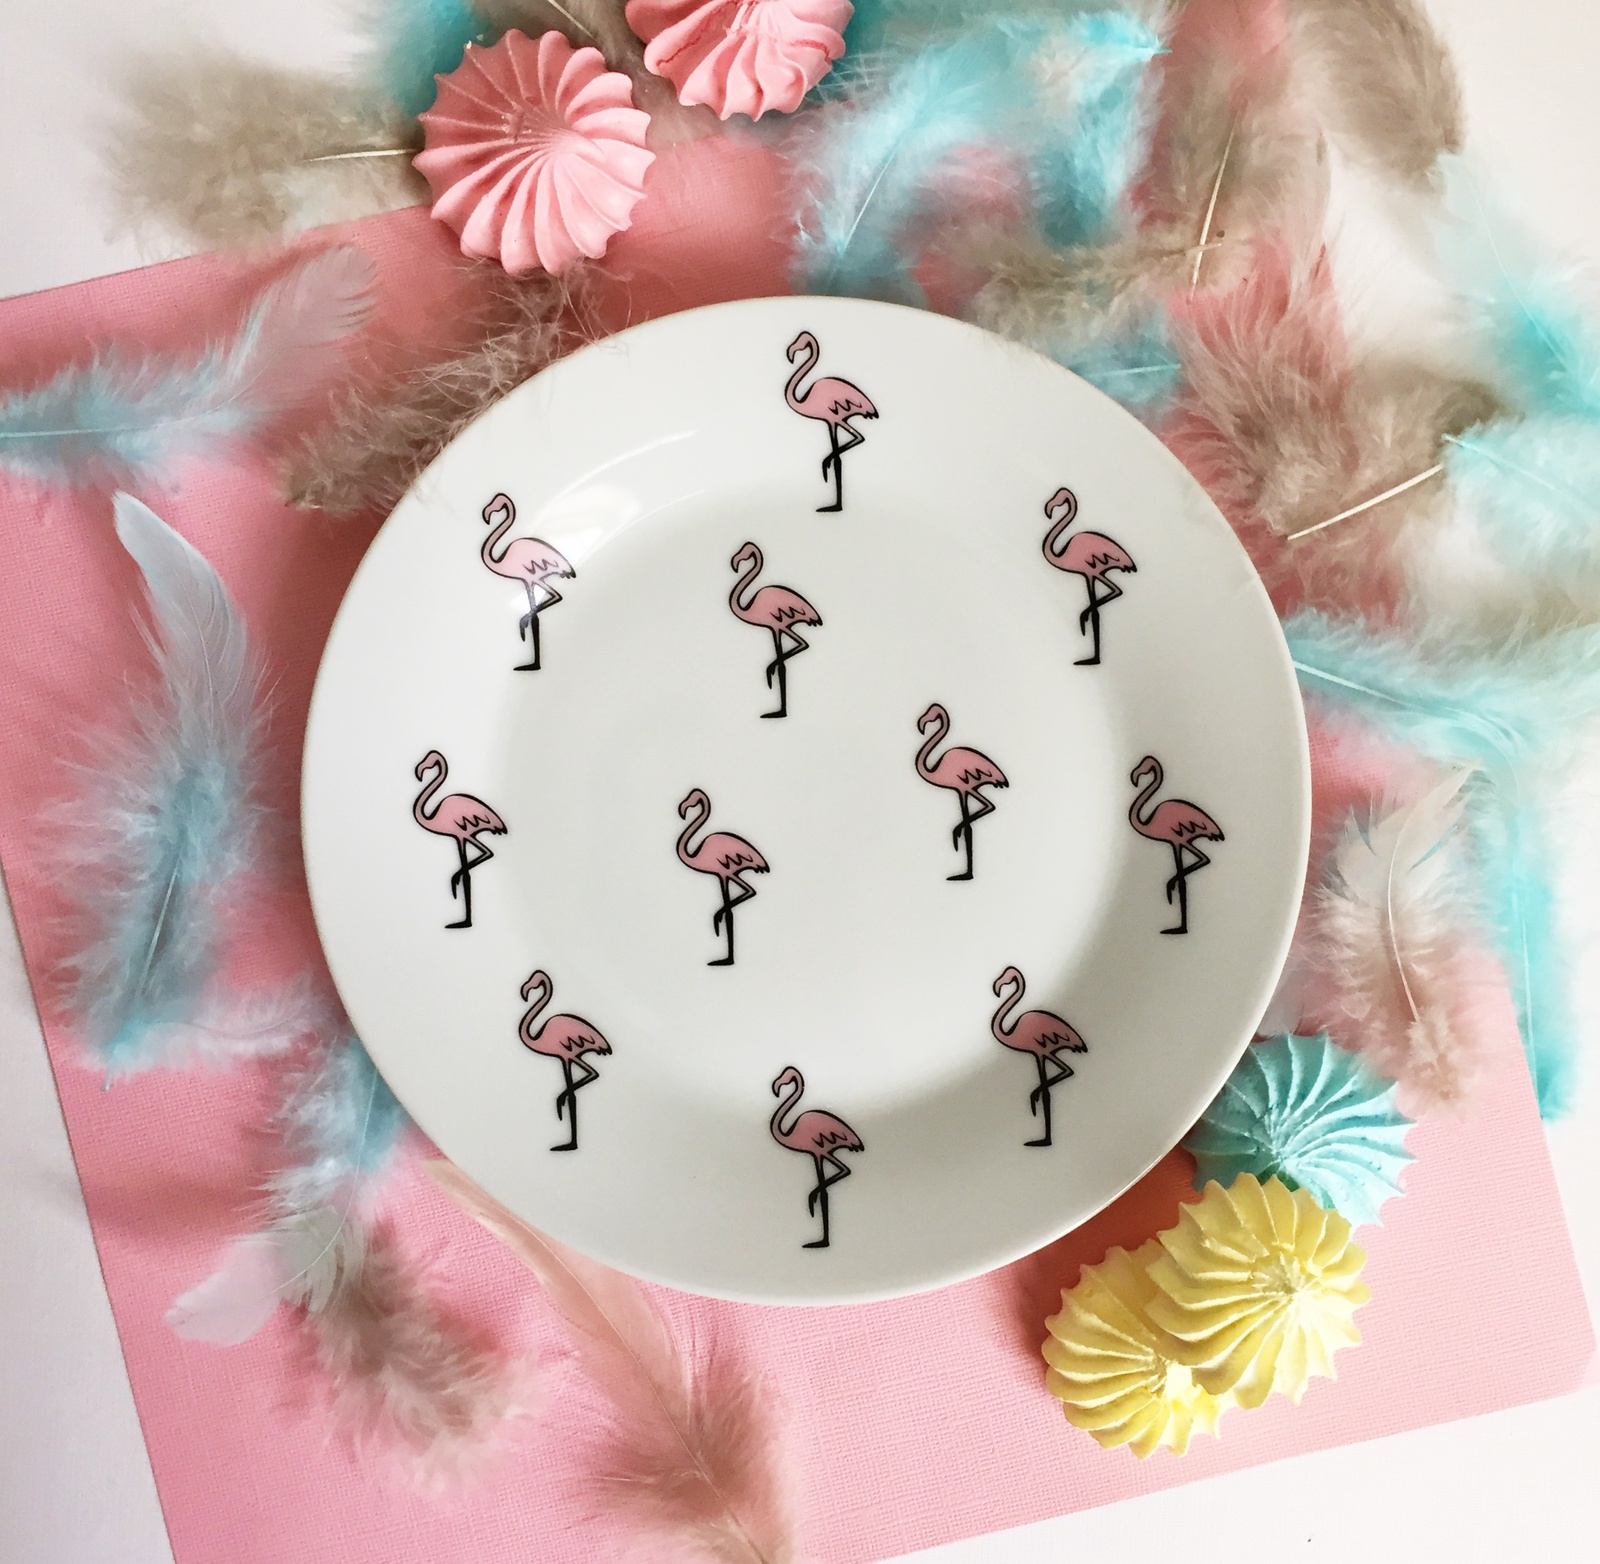 Тарелка Сотвори Чудо Розовый фламинго 20 см, белый тарелка мелкая сотвори чудо воздушный город диаметр 20 см